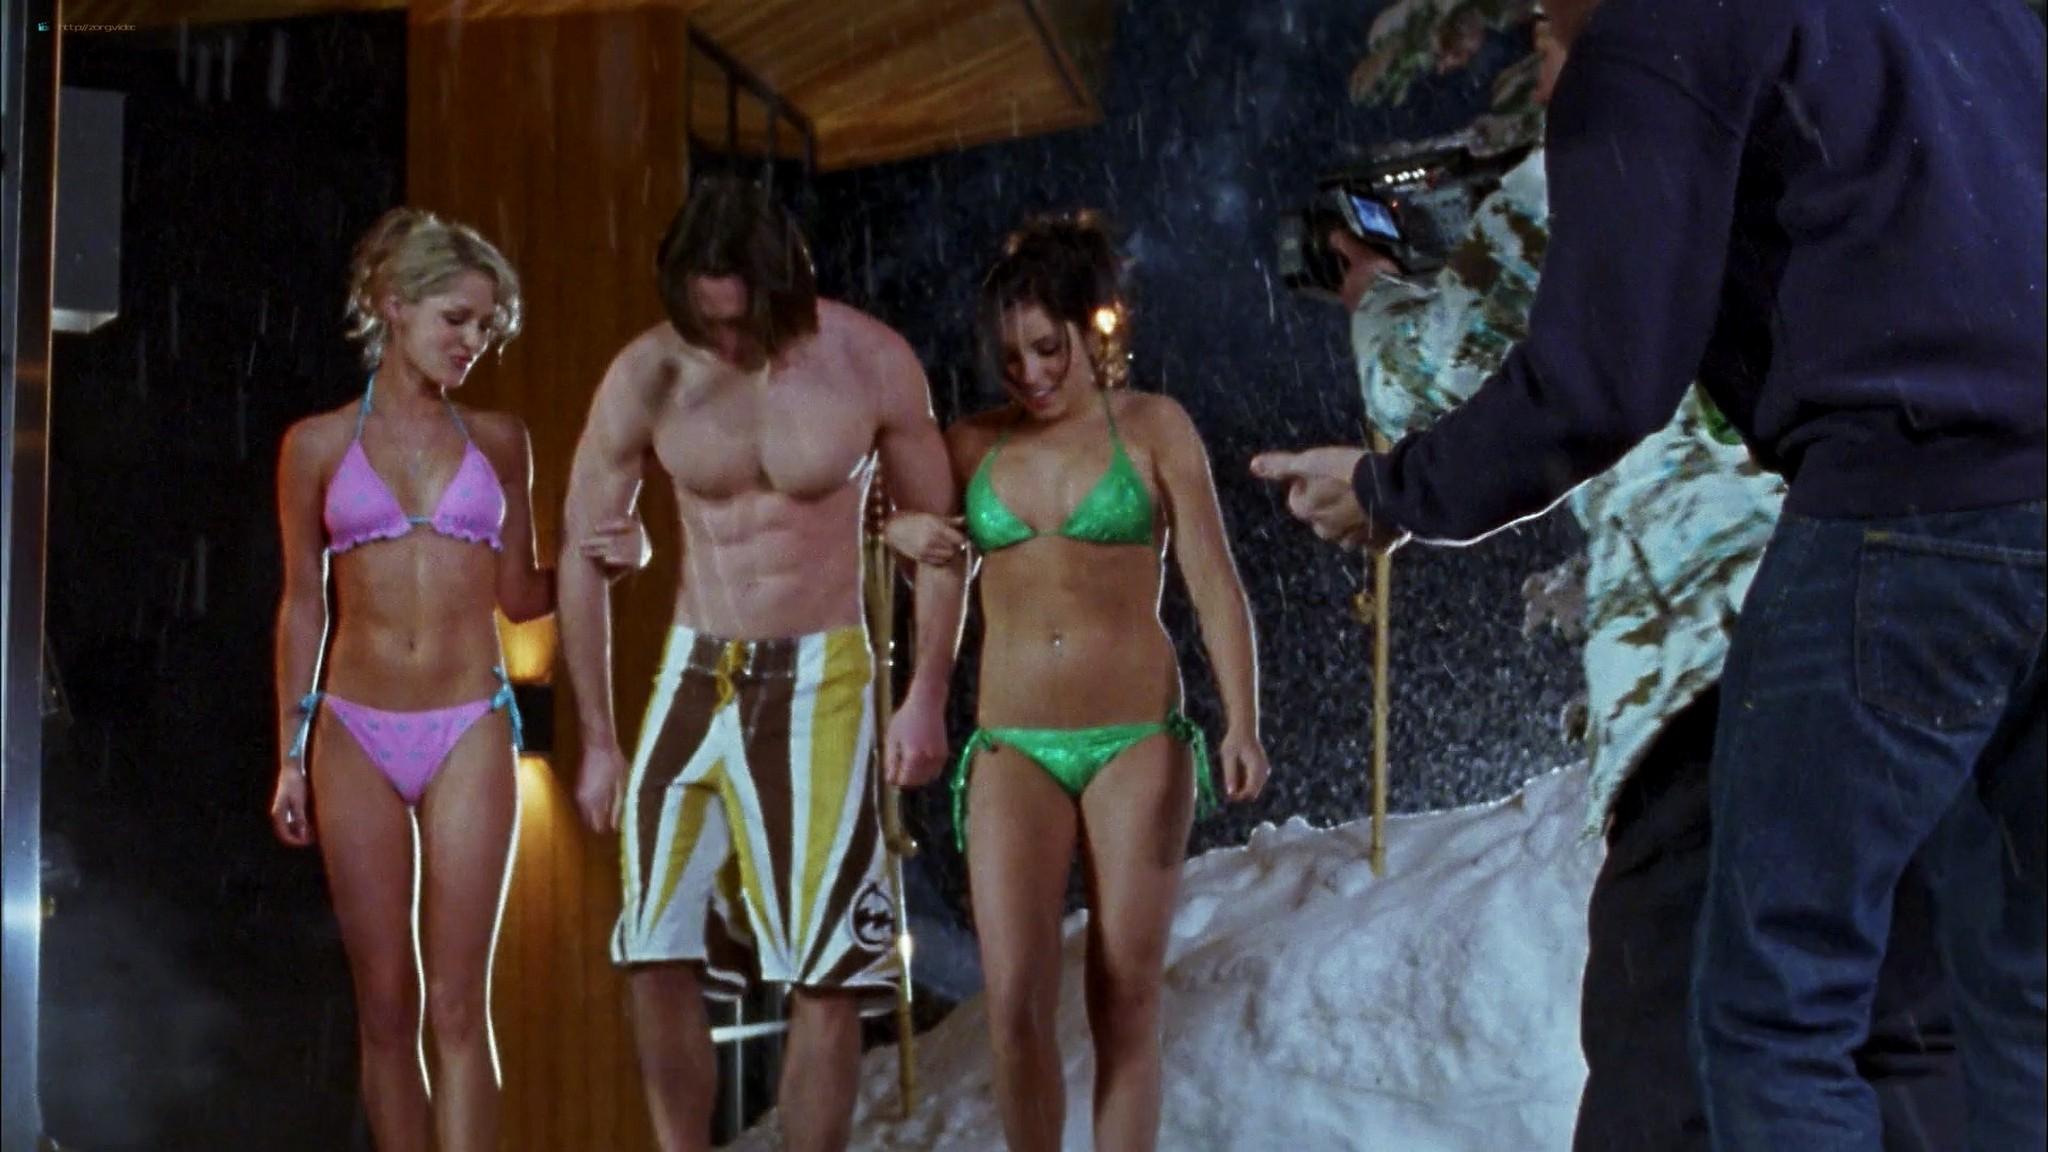 Lindsay Maxwell nude Amber Borycki sexy - Revenge of the Boarding School Dropouts (2009) HD 1080p Web (15)